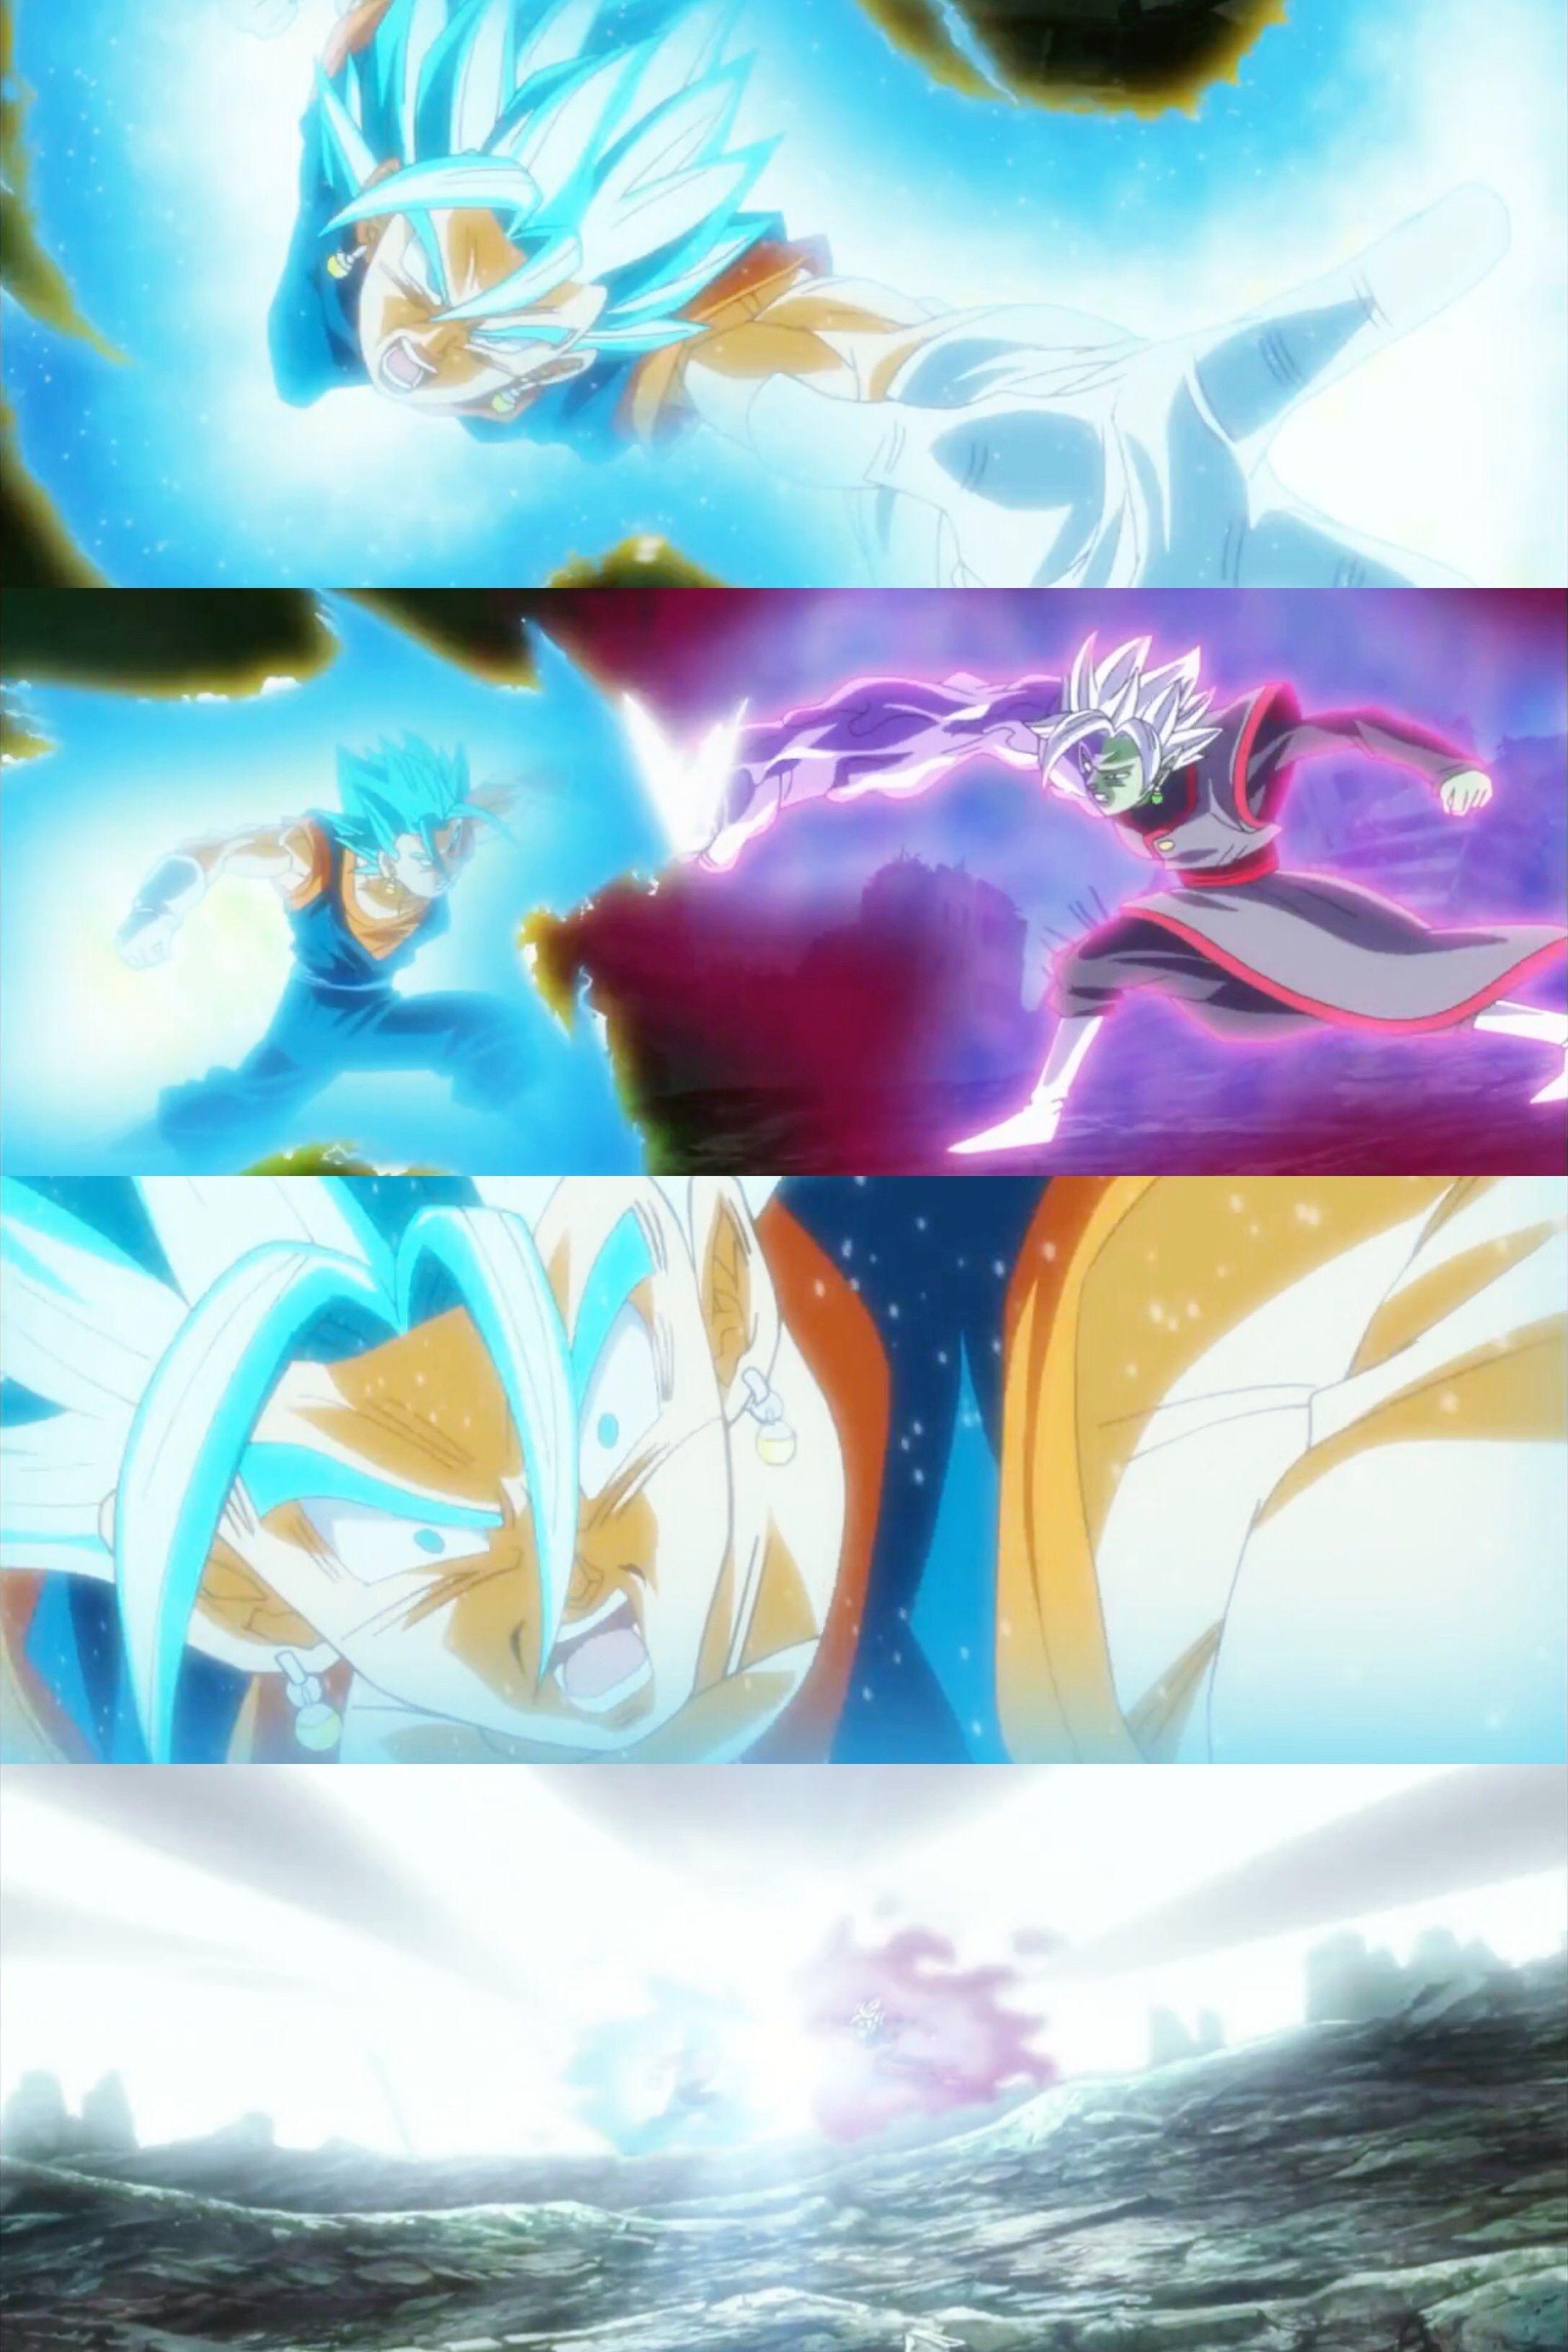 Vegito Blue God Vs Zamasu God Potara Fusion Plus Size Phone Wallpaper Made With Moldiv Collage App Dragon Ball Super Dragon Ball Dragon Ball Z